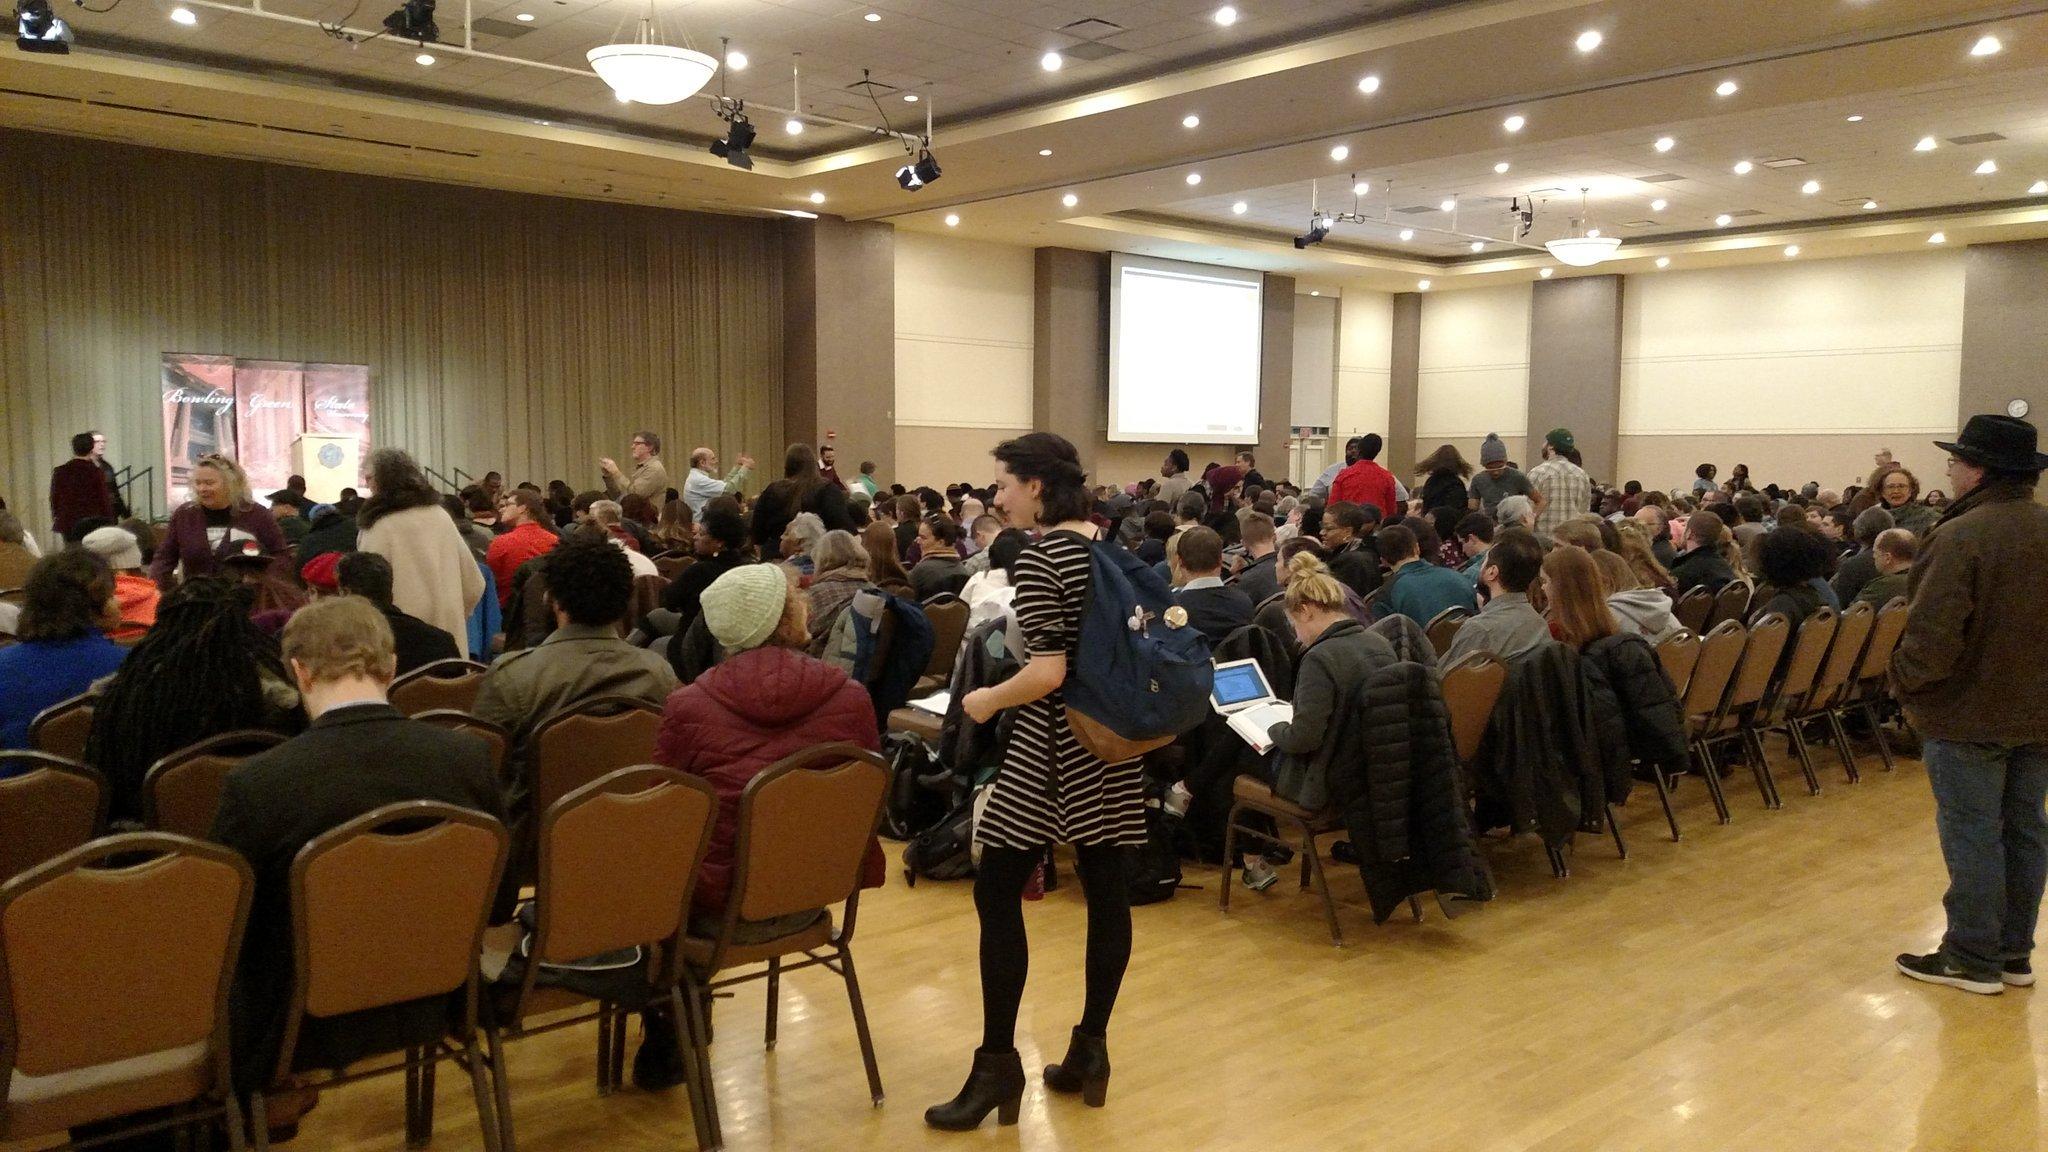 The crowd arrived early to hear Dr. Cornell West speak. @CornelWest #BGSU https://t.co/QWnvtQOH8M